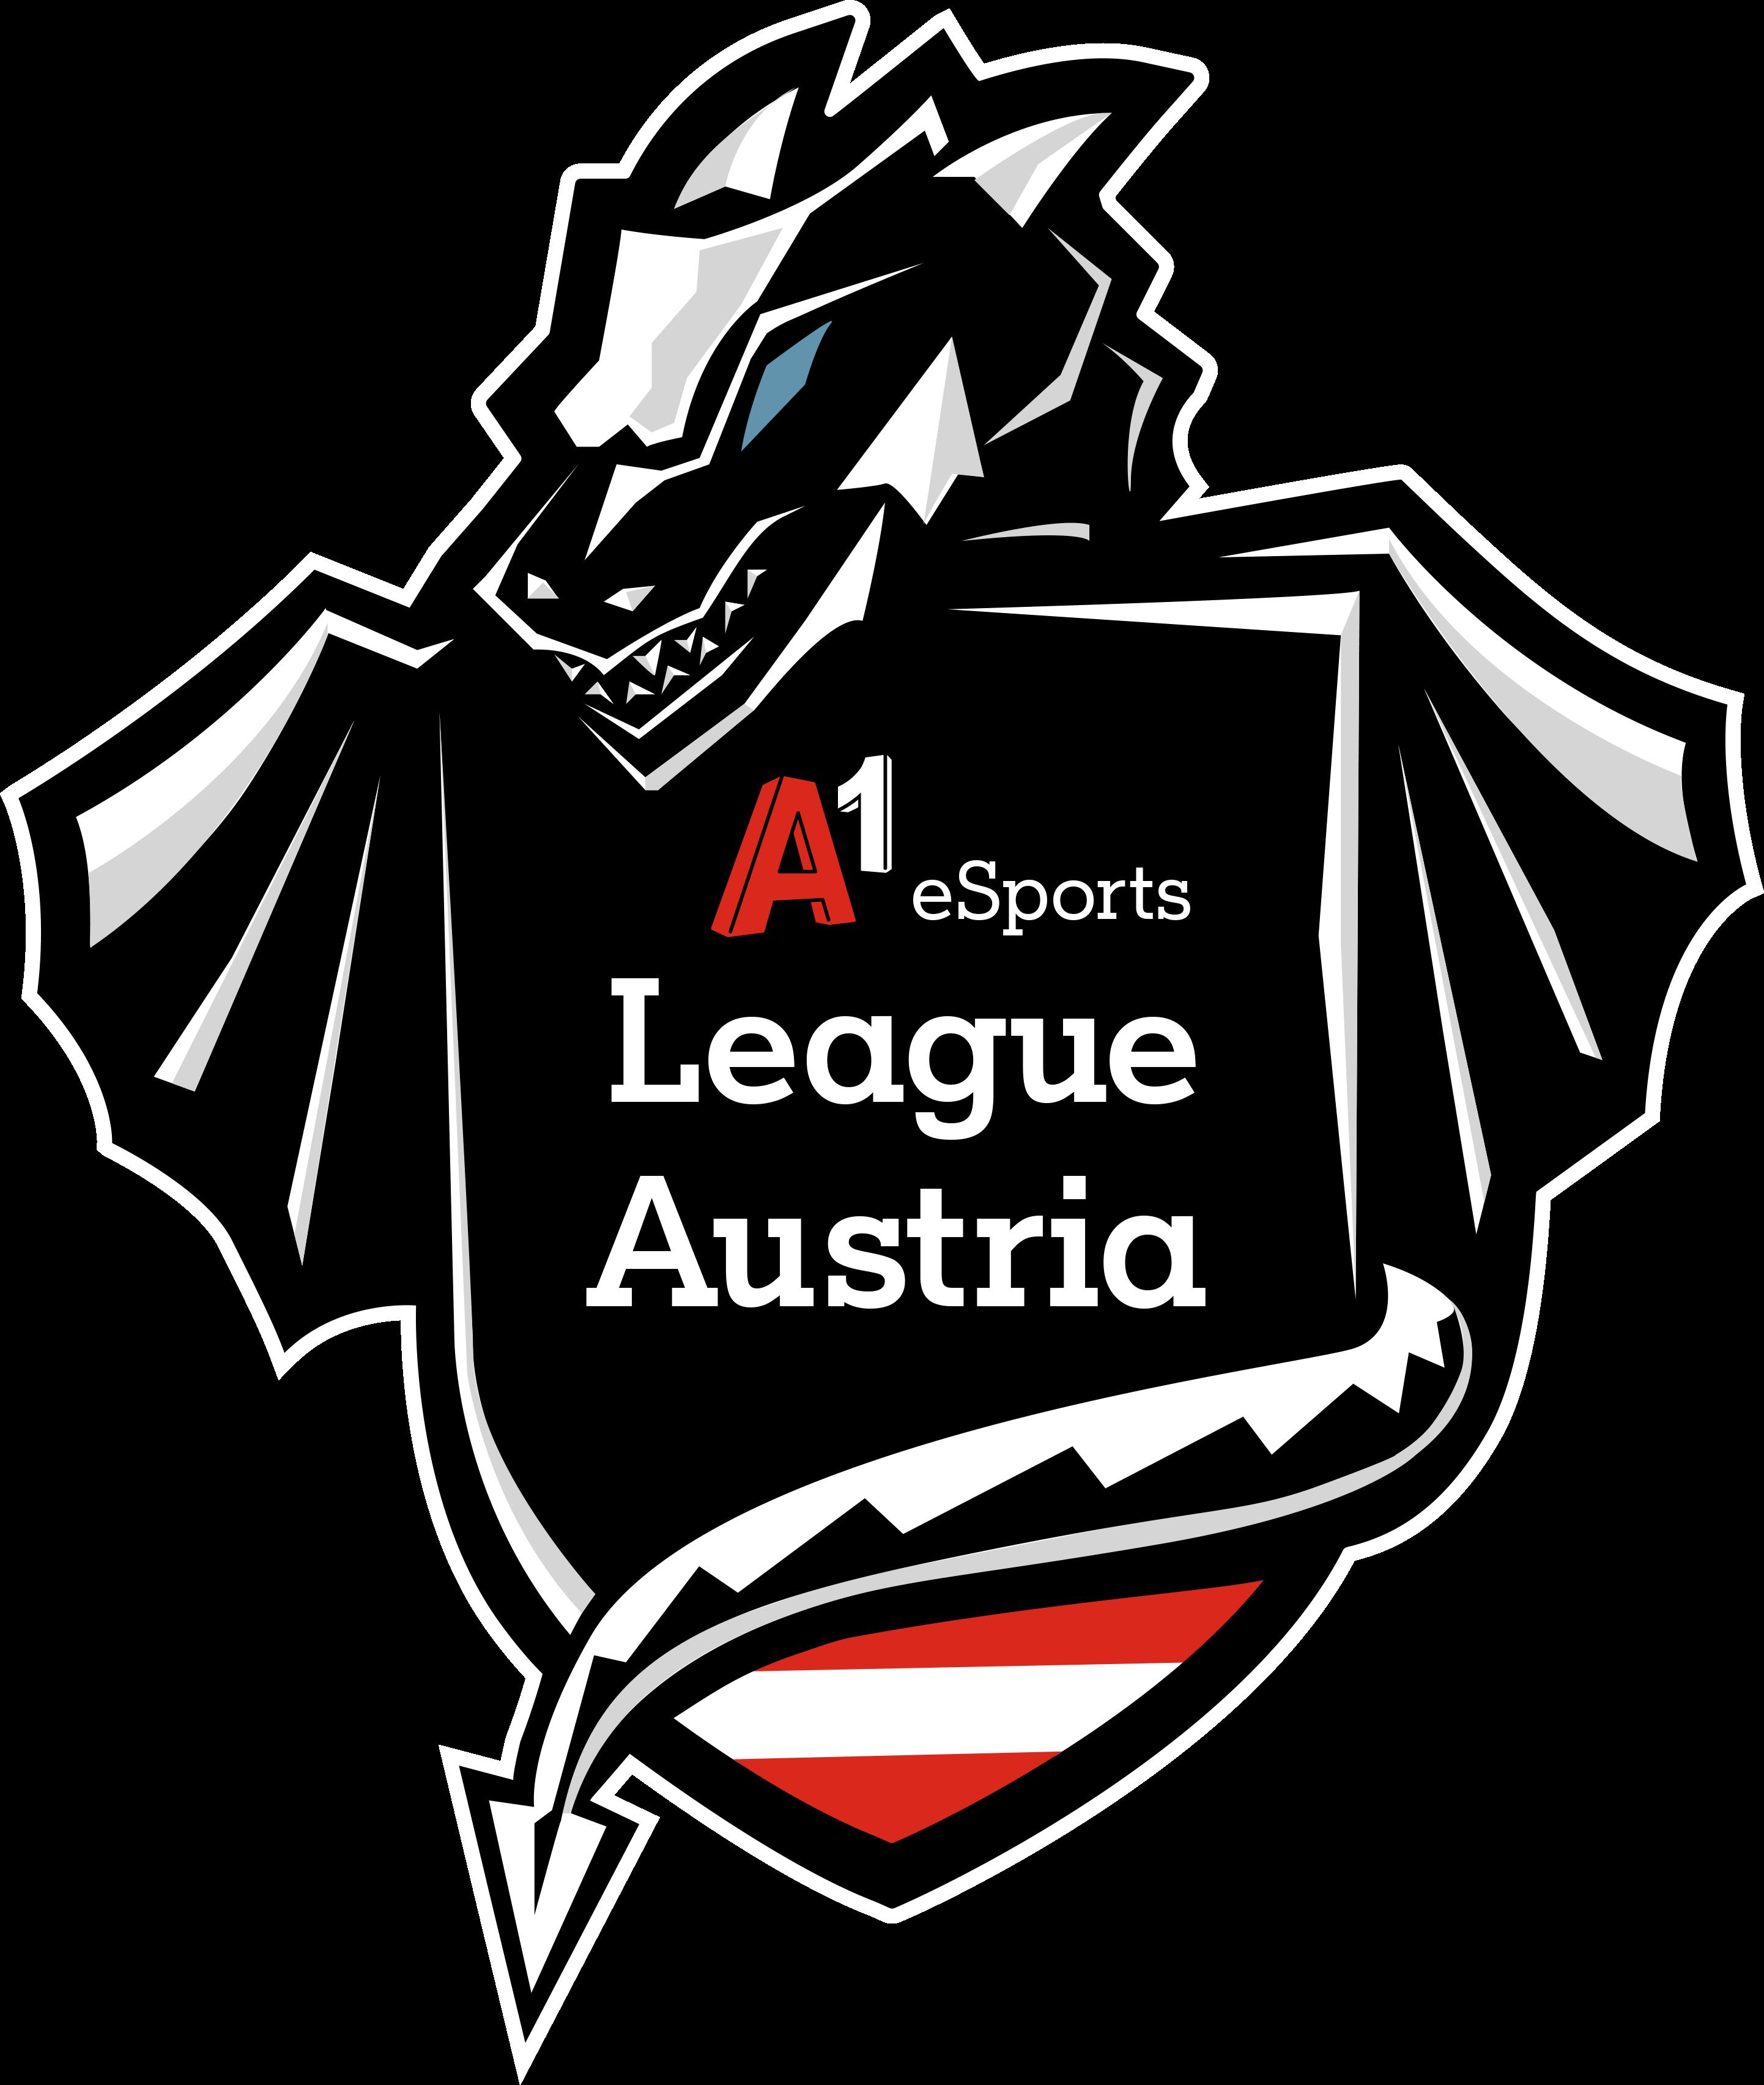 A1 eSports Wappen